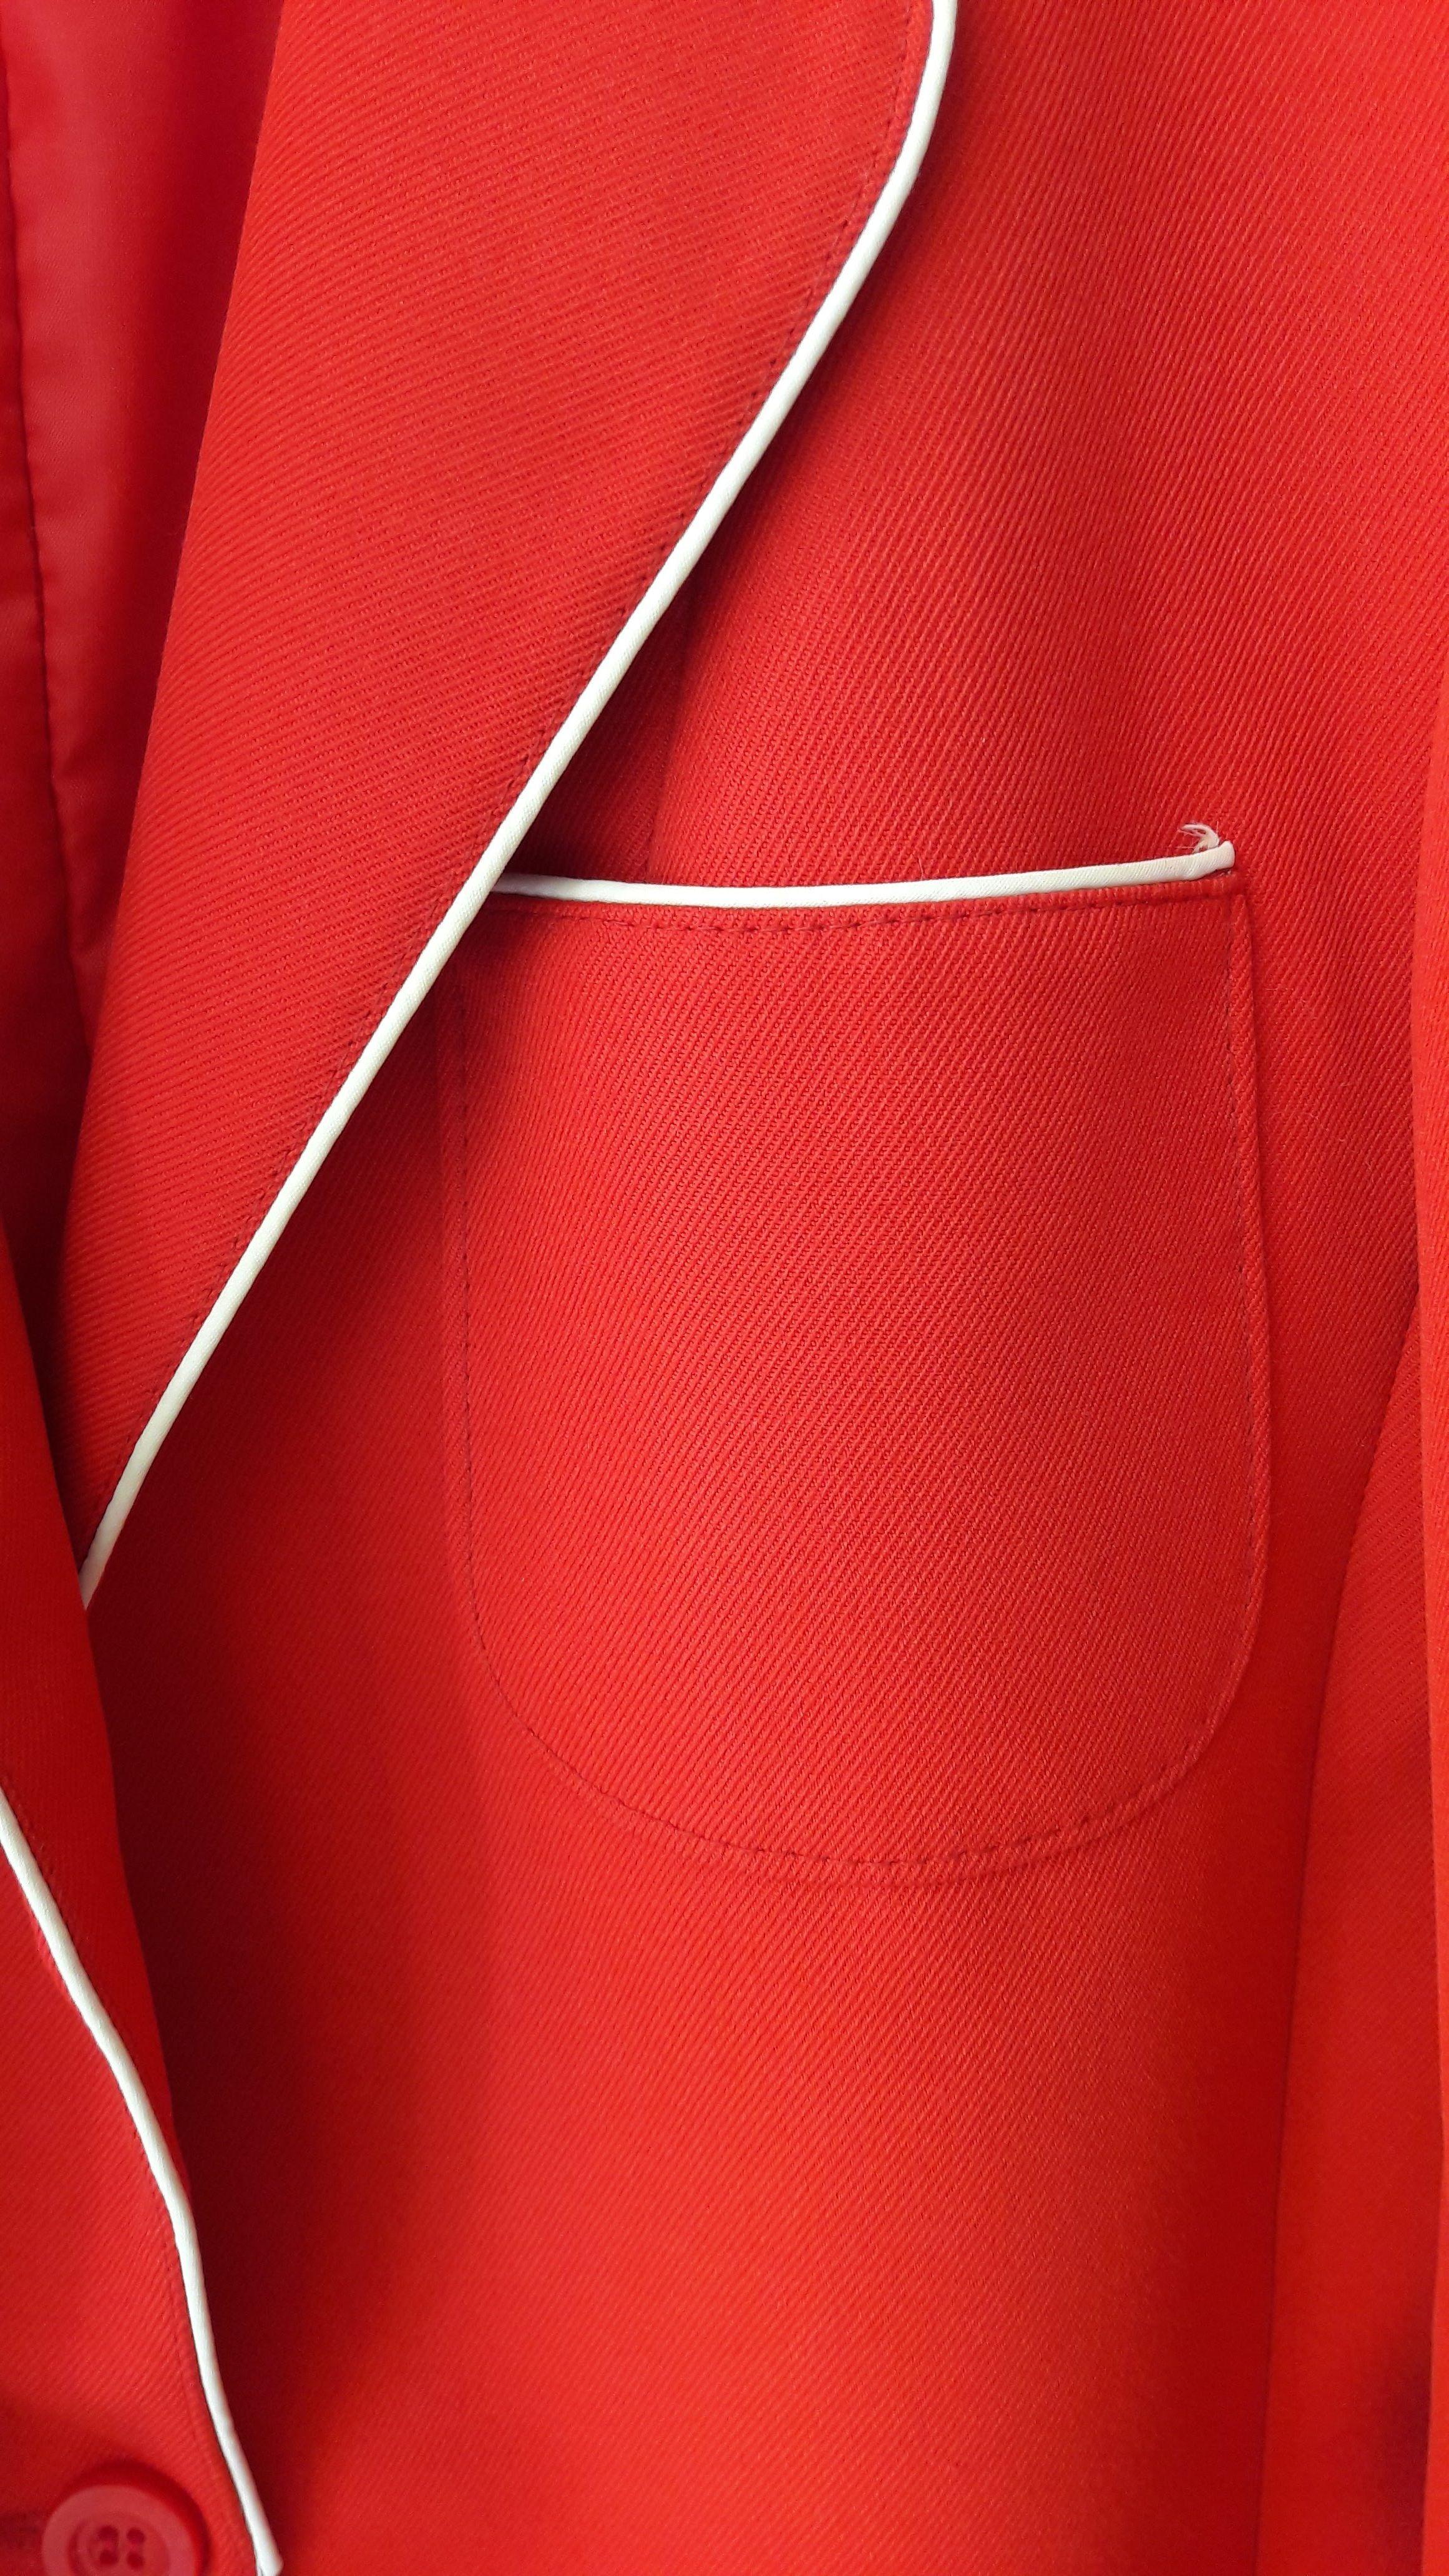 Vestes - Blazer rouge